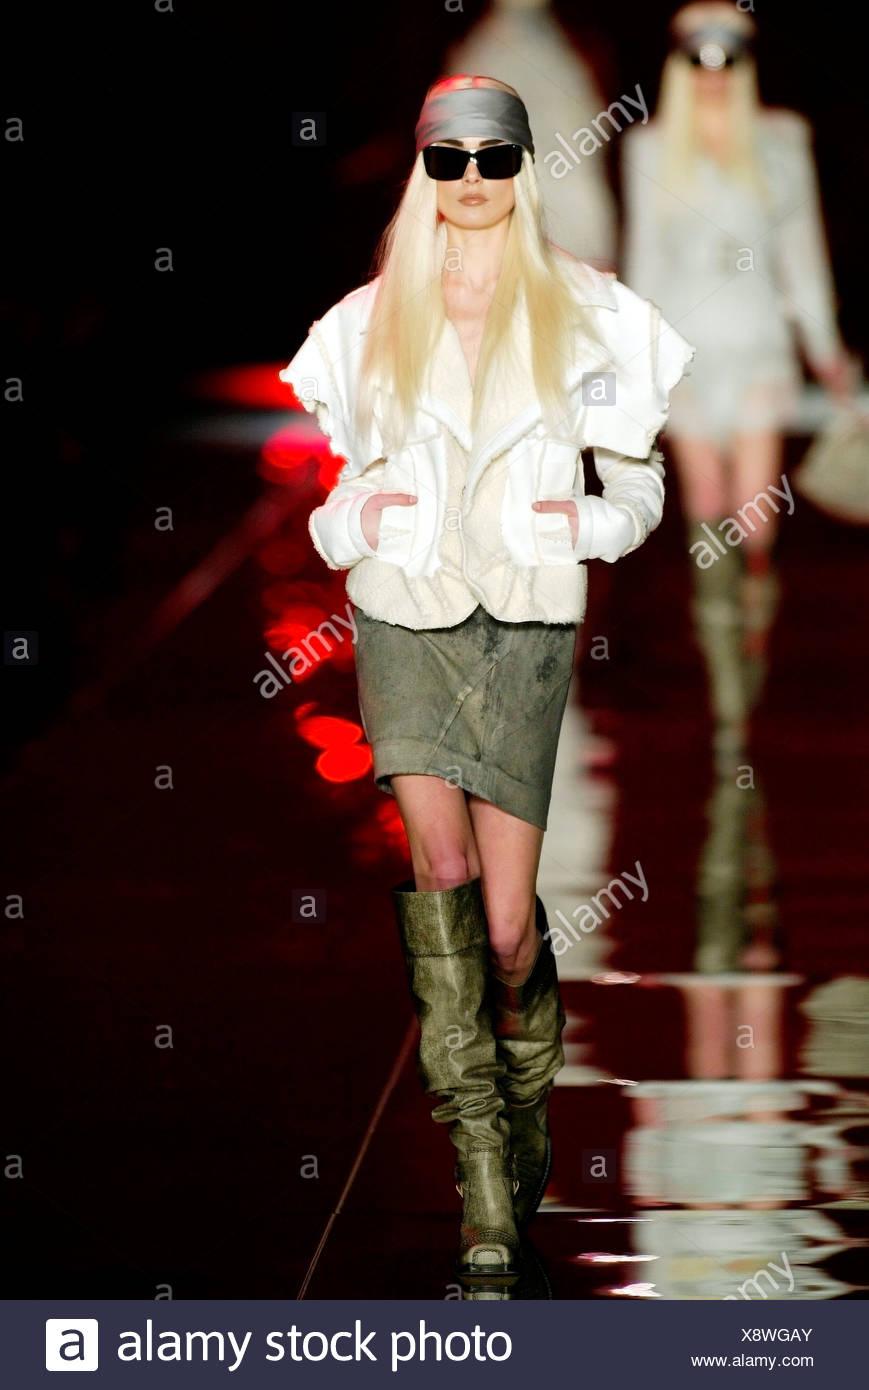 733e2f65c7 Christian Dior Ready to Wear Paris A W Model Inguna Butane very long  straight blonde hair in